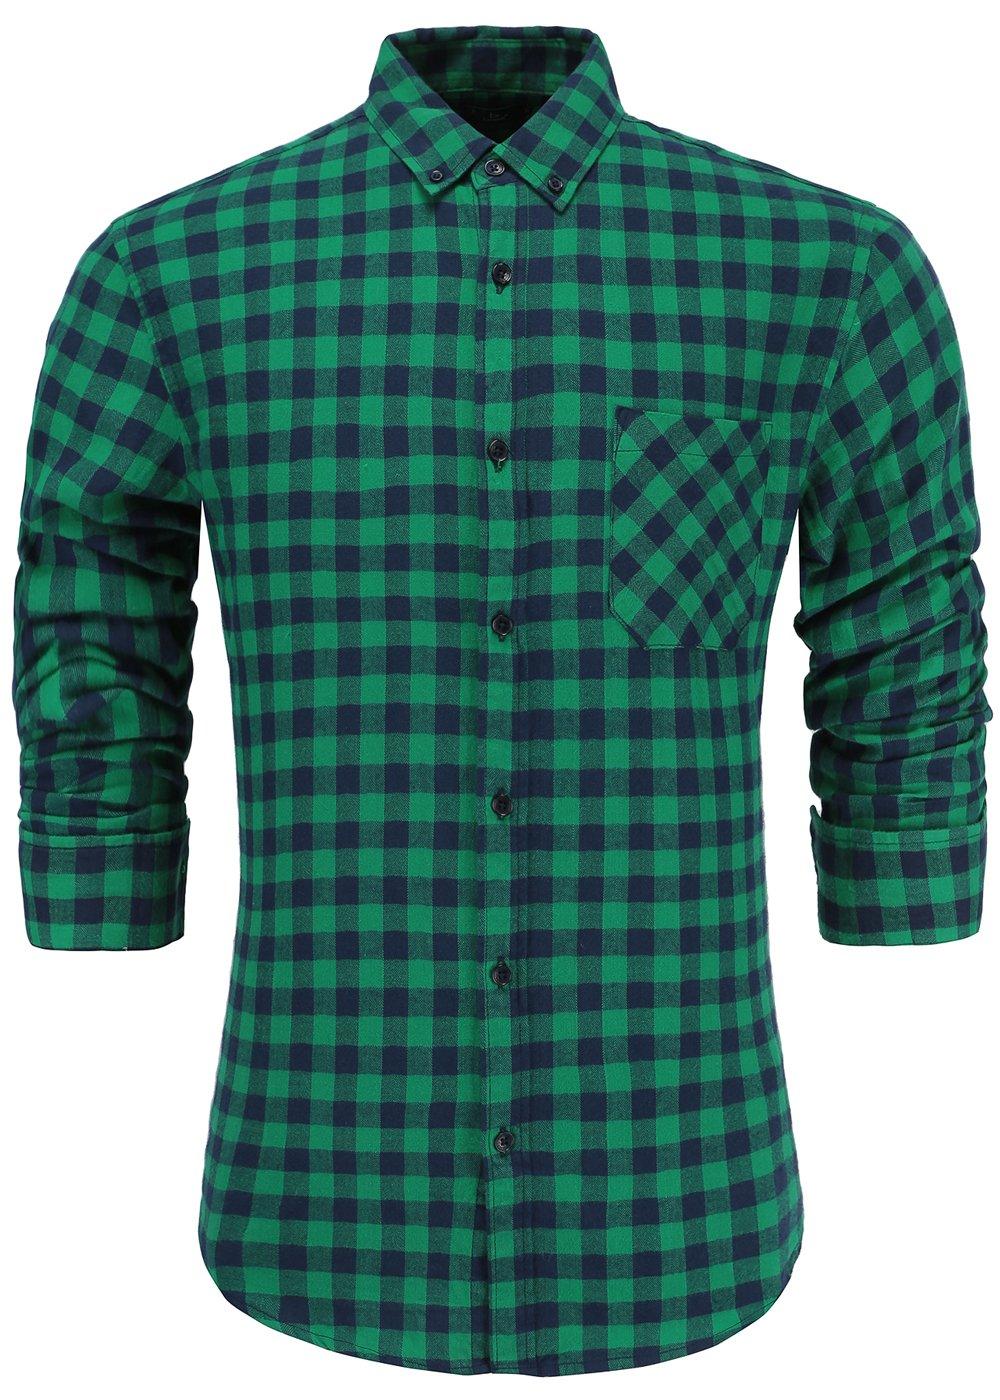 Emiqude Men's 100% Cotton Slim Fit Long Sleeve Button-Down Big Plaid Dress Shirt Medium Green Navy